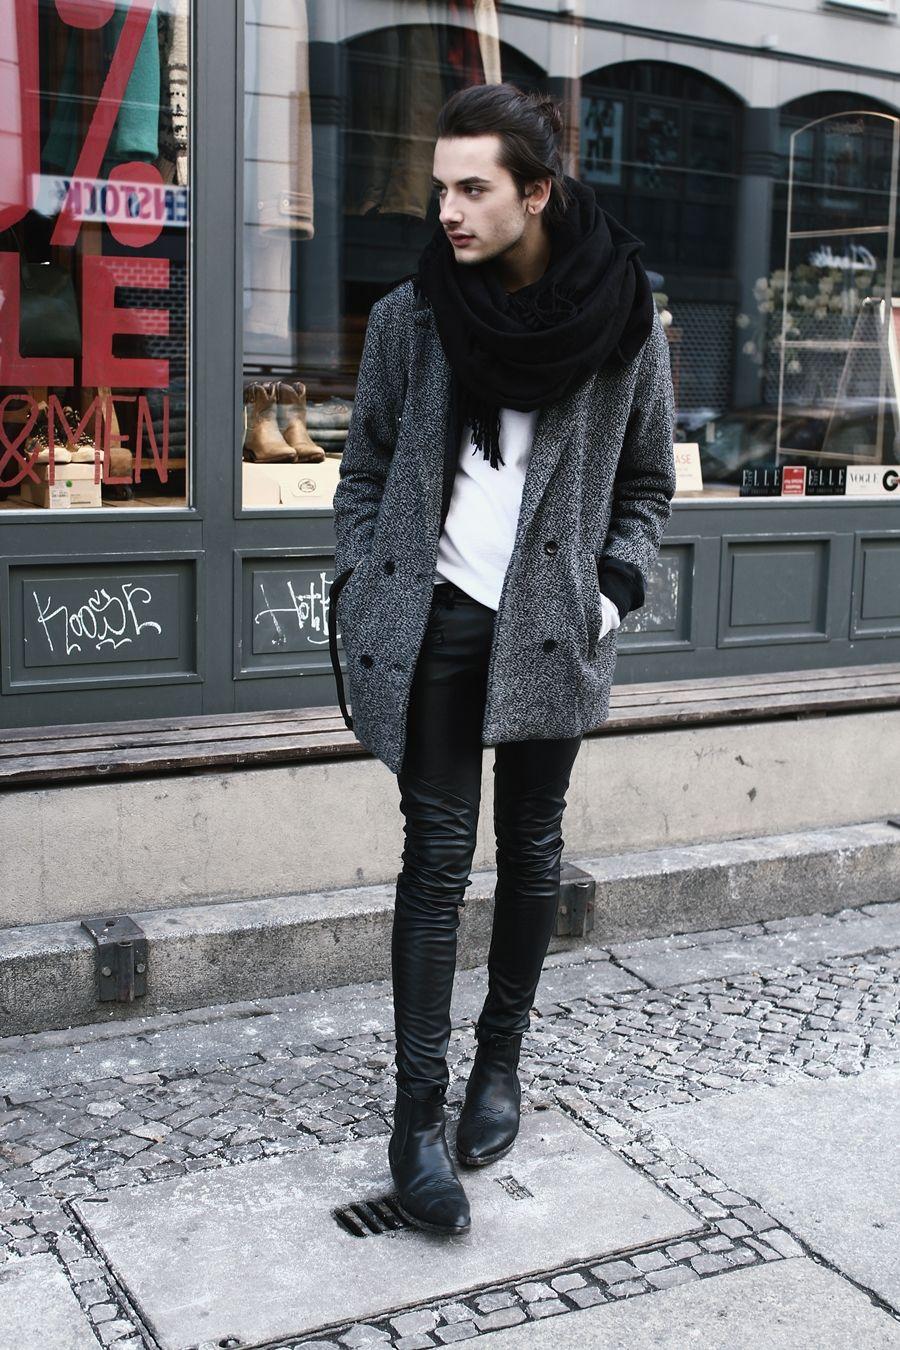 WORMLAND <3 shiggersonstreet.com || Streetstyle Inspiration for Men! #WORMLAND Men's Fashion